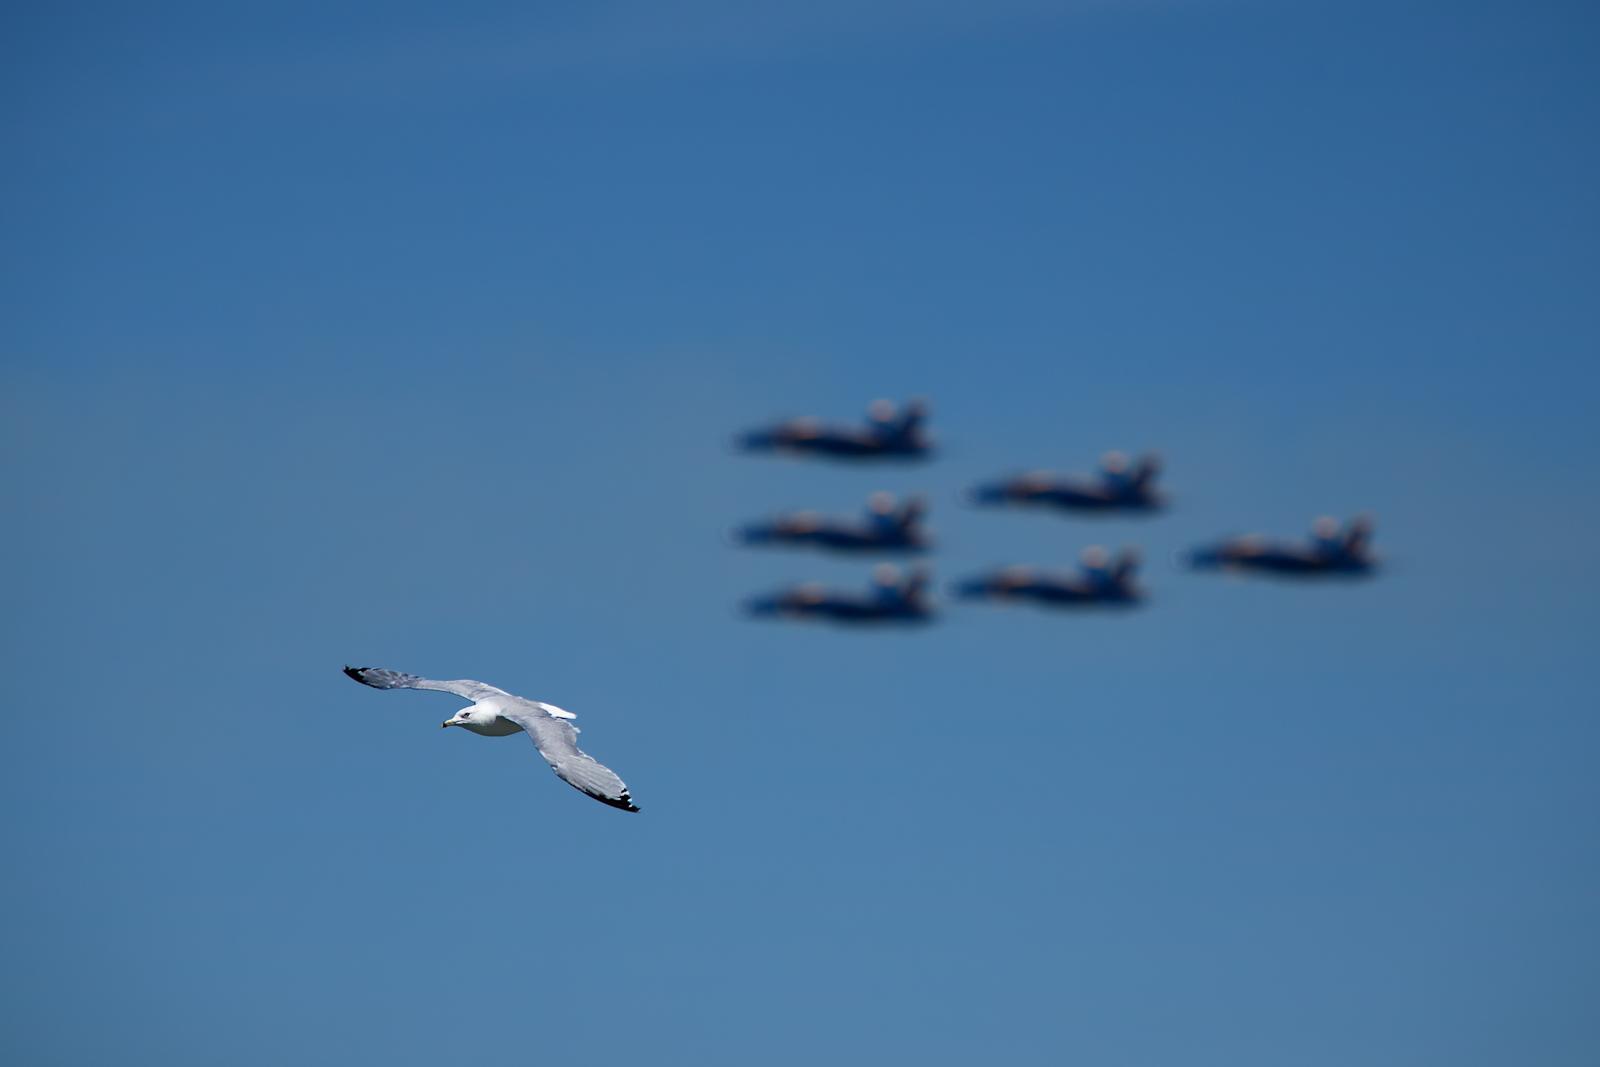 F-16,air show,airplane,bird,blue angels,chicago,chicago air & water show,chicago air and water show,contrast,fighter jet,flight,gull,horizontal,navy,plane,sea gull,seagull,speed,u.s. navy,united s, photo